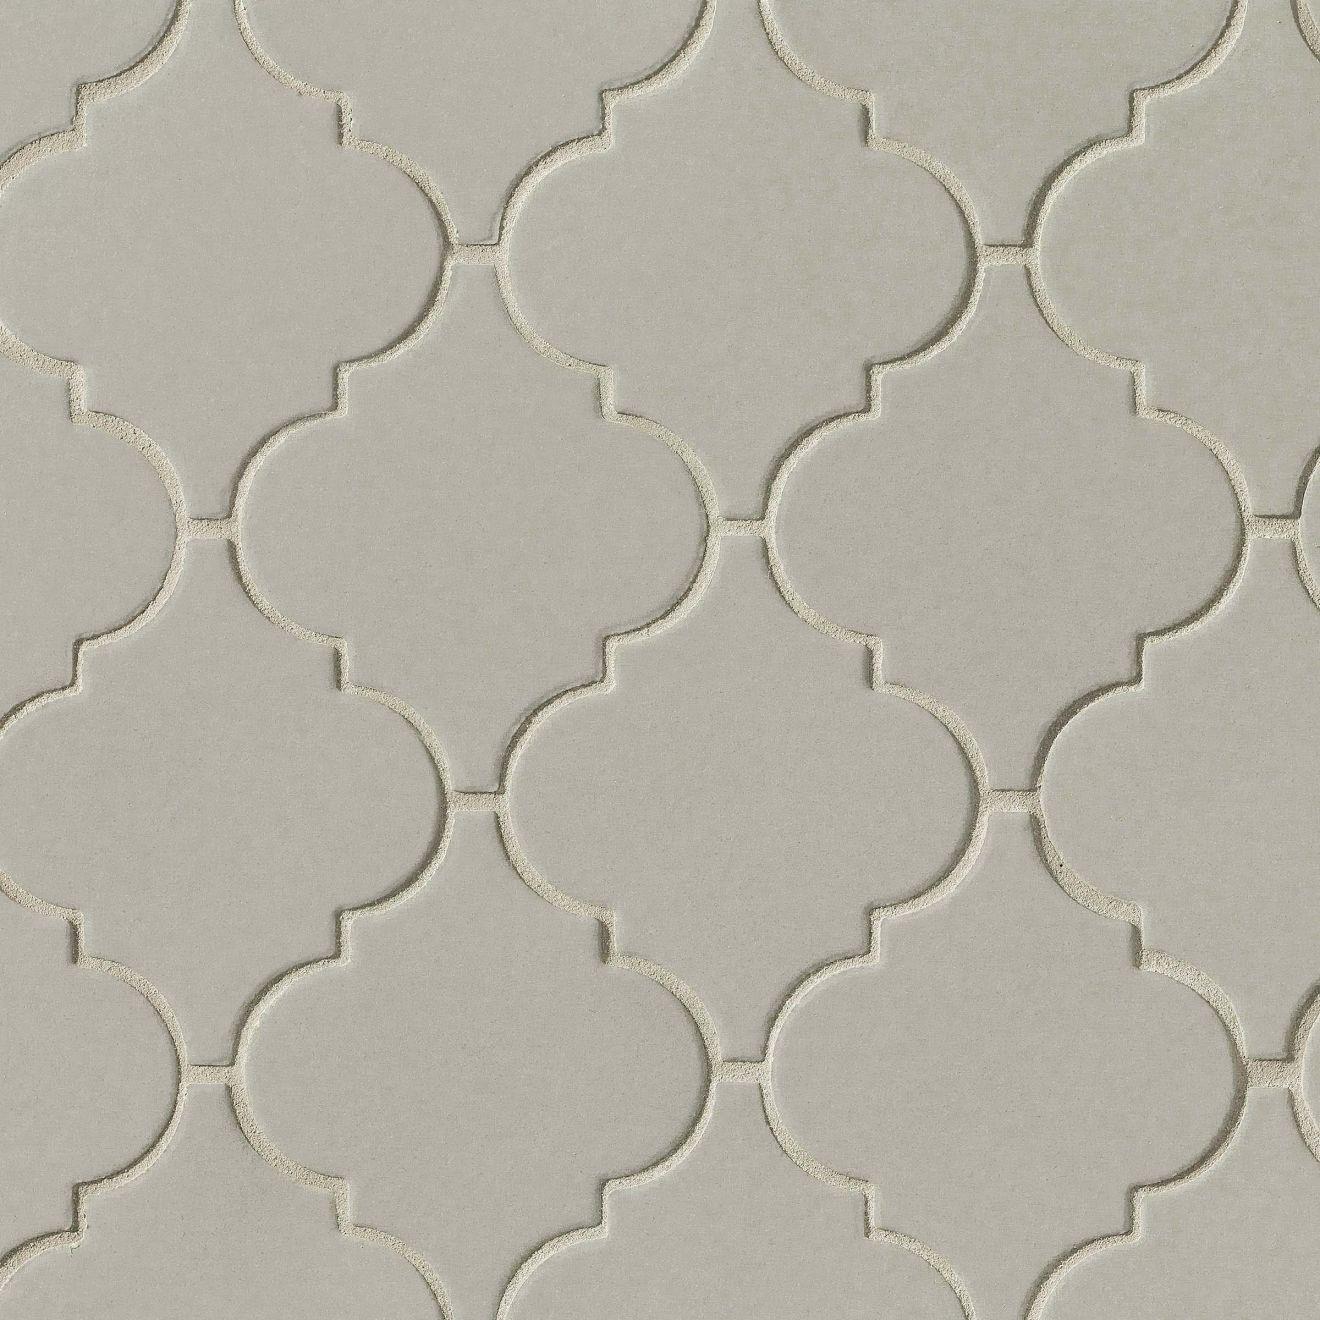 Costa Allegra Floor & Wall Mosaic in Cinder